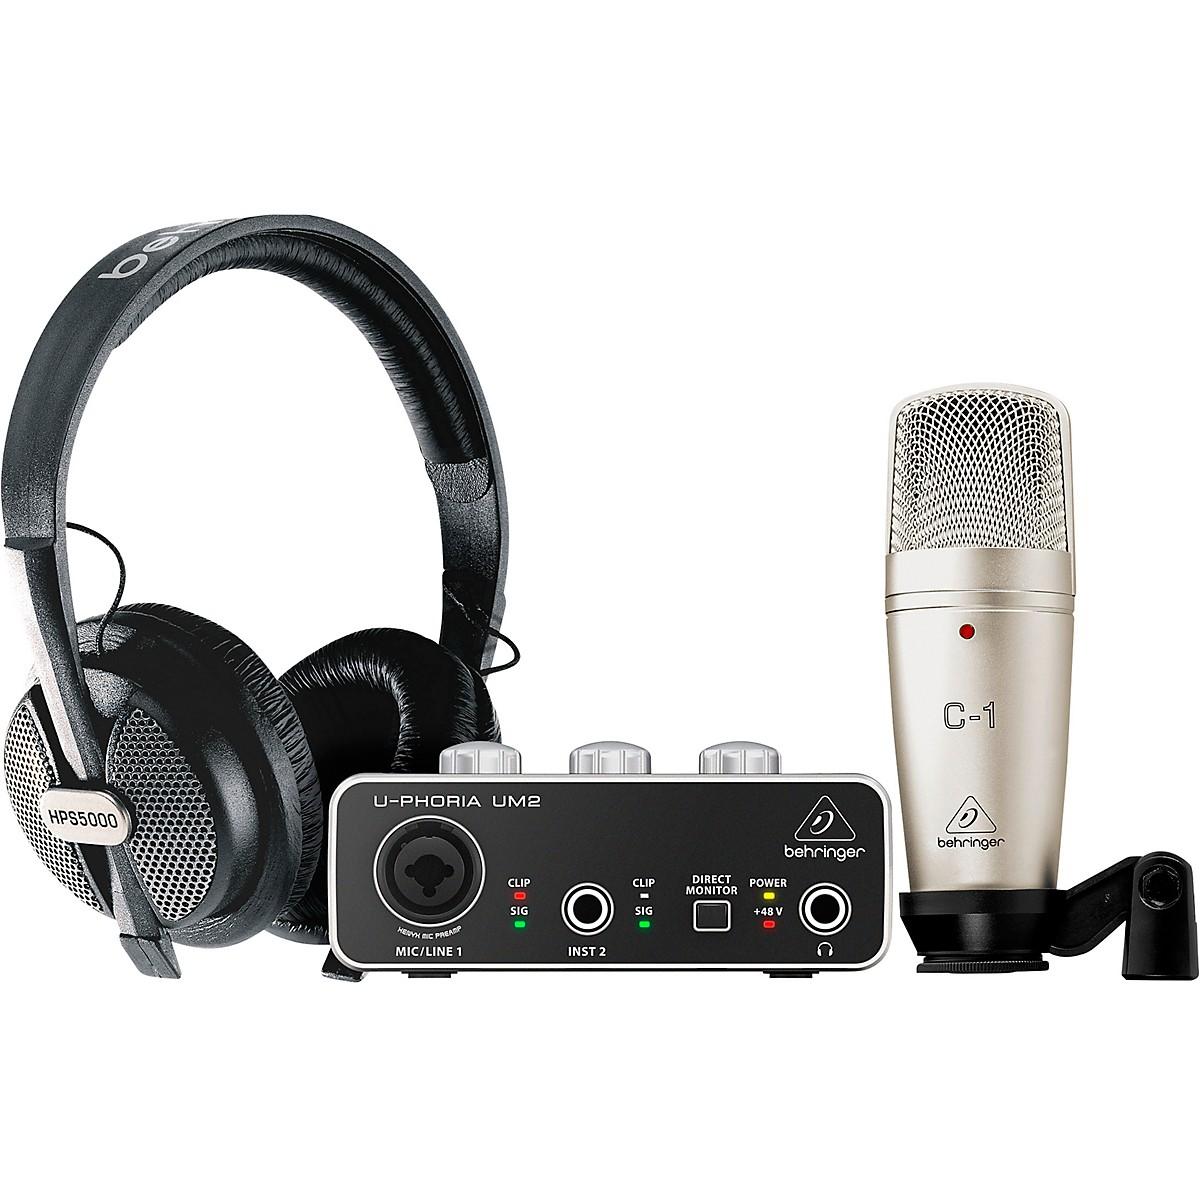 Behringer U-PHORIA STUDIO Complete Recording/Podcasting Bundle